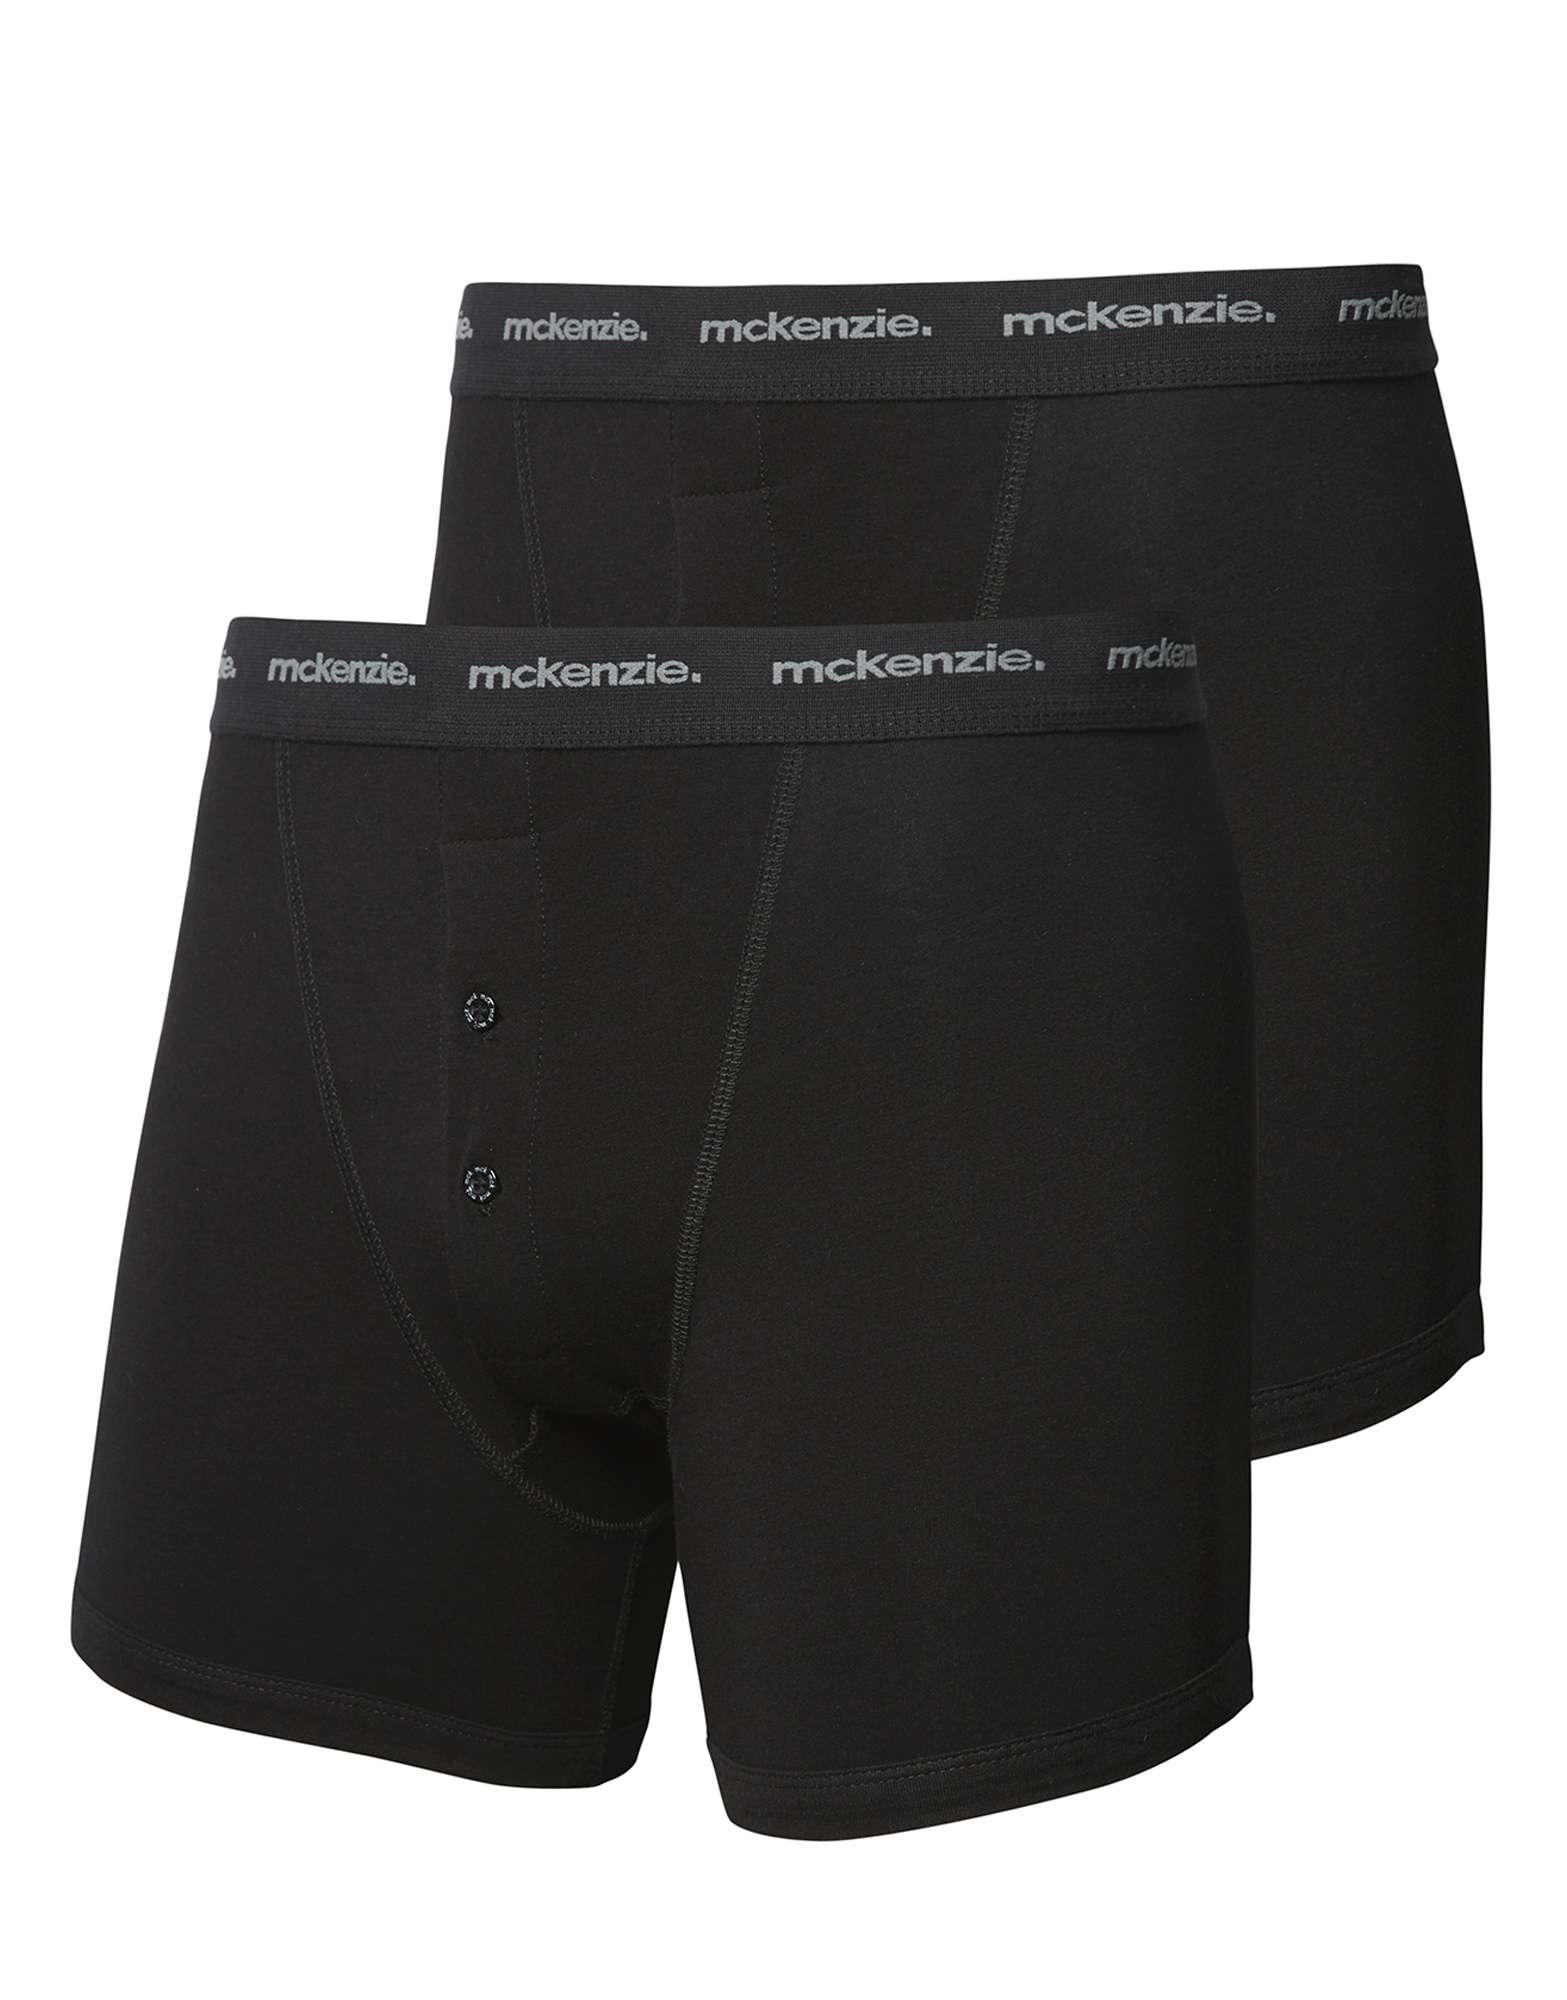 McKenzie 2 Pack Cotton Boxers